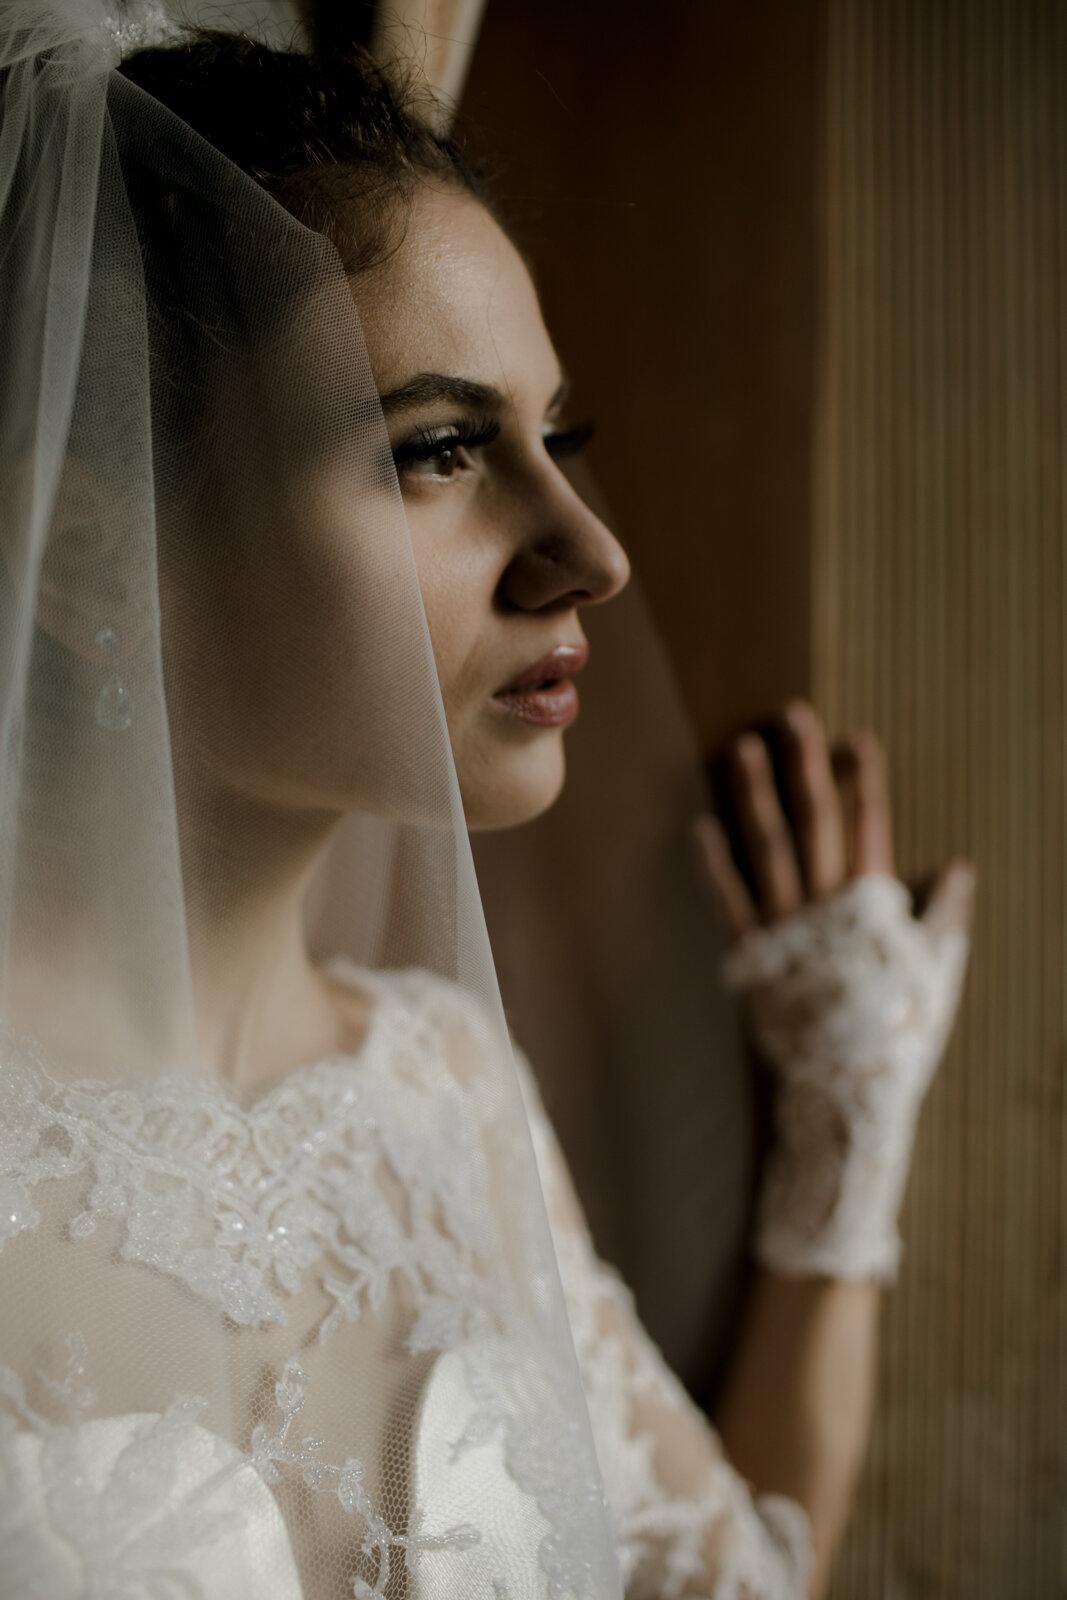 FCMAISON_BRIDE_VANESSAILLI_MOD_b-105.jpg